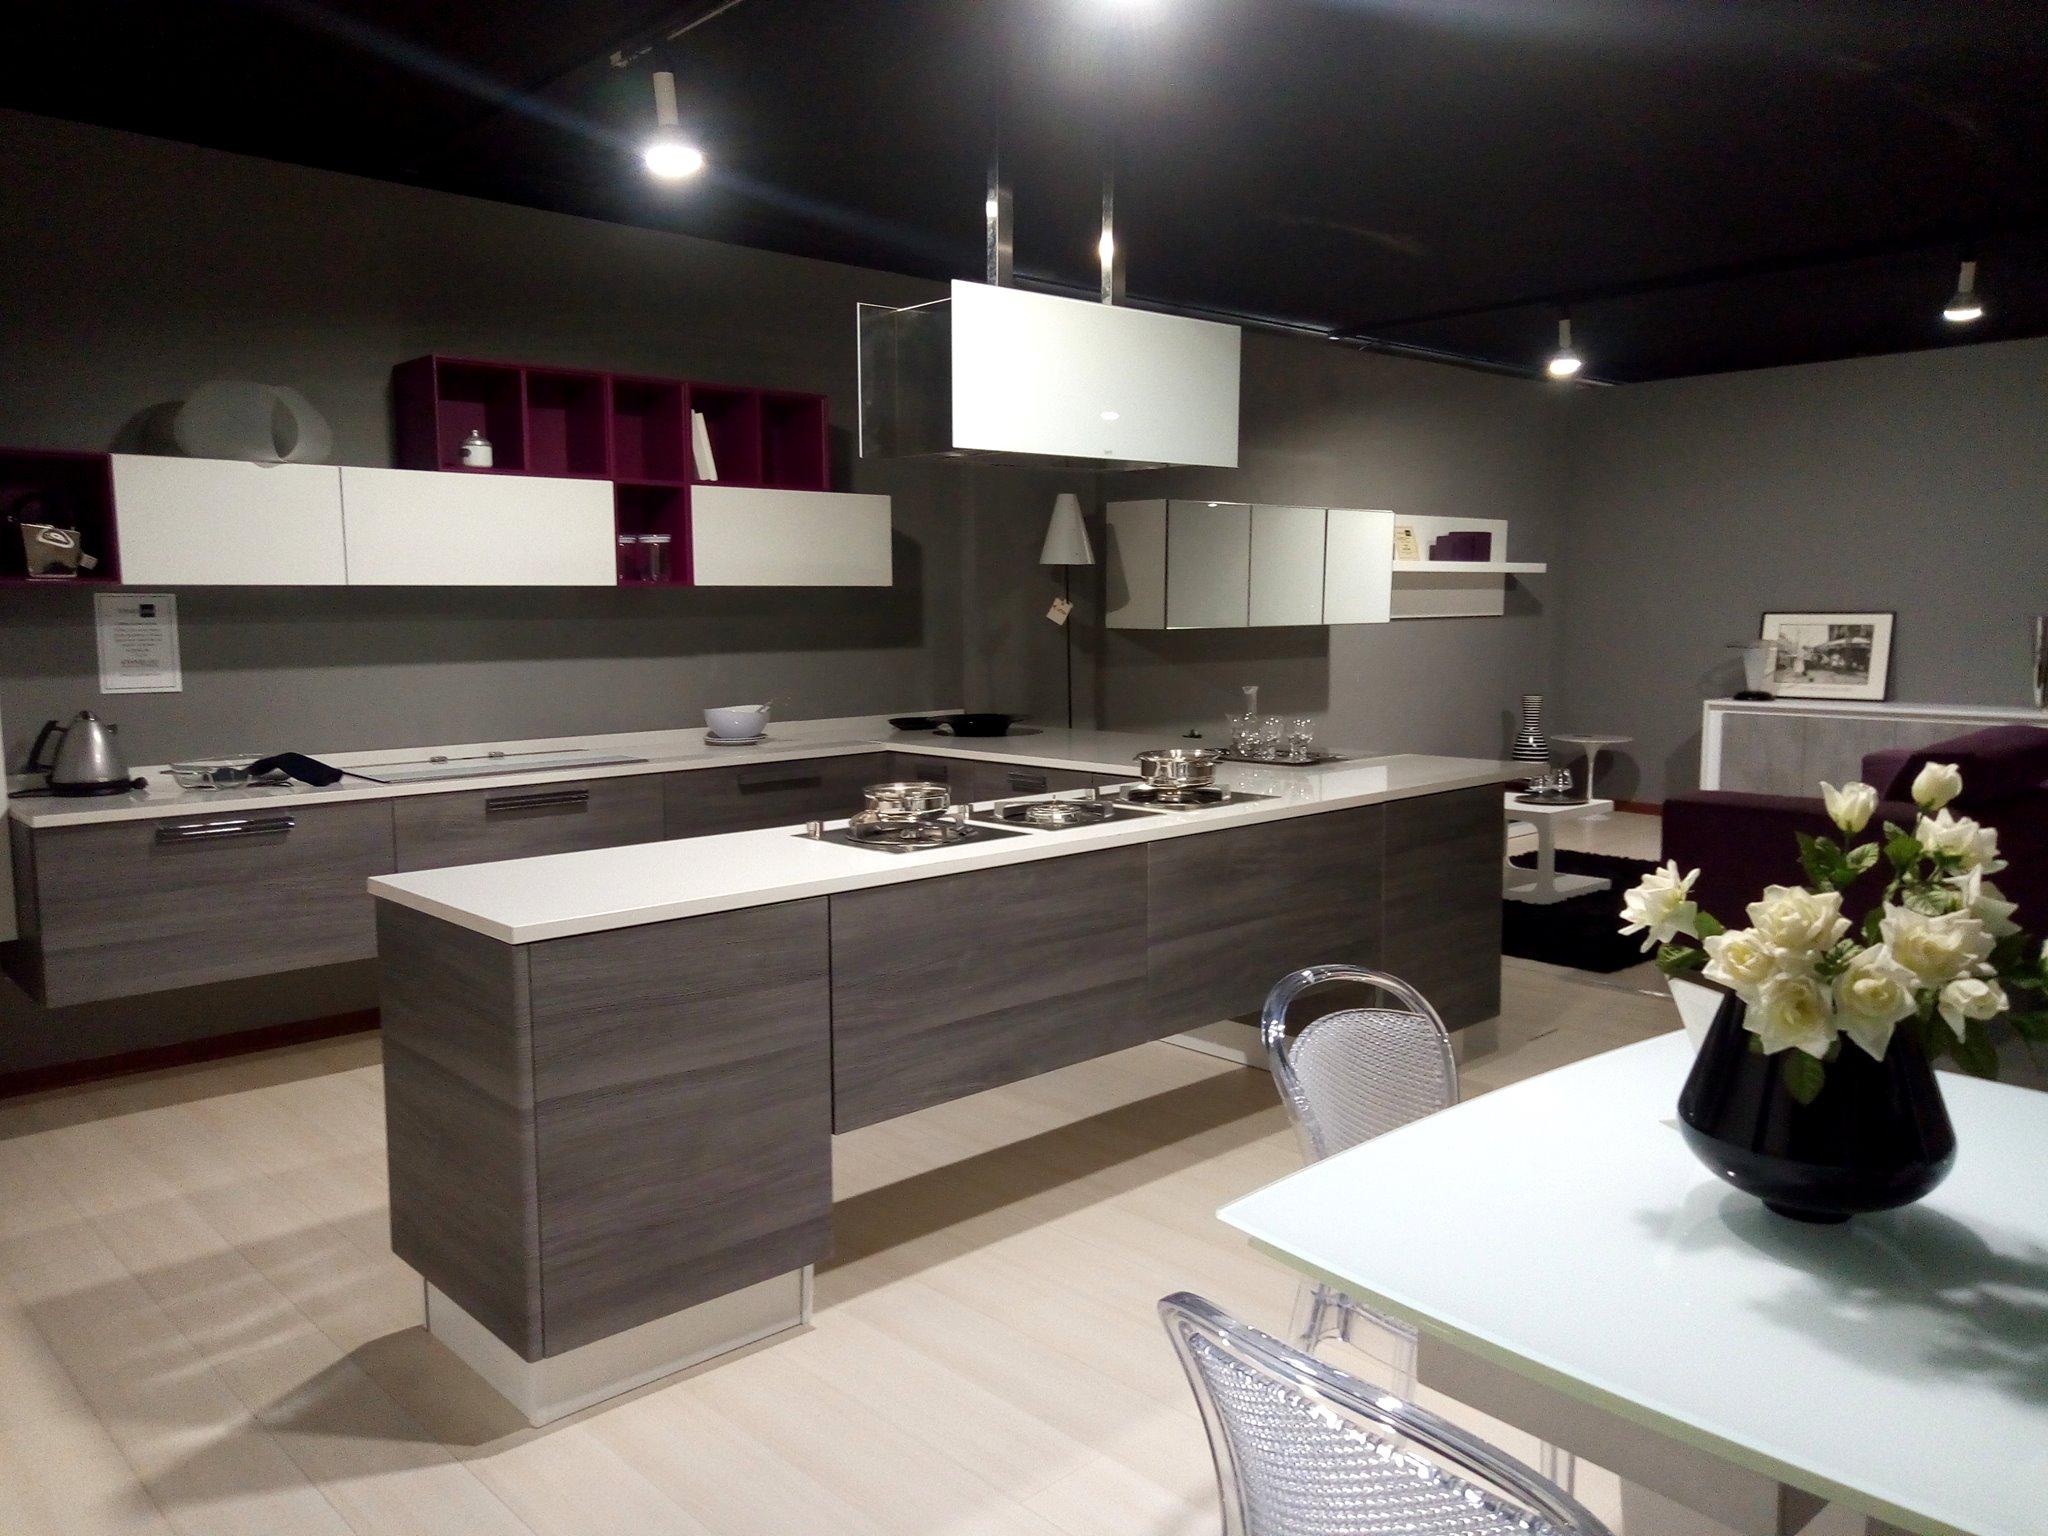 Cucina In Polimerico Difetti. Gallery Of Cucina Lube Nilde ...